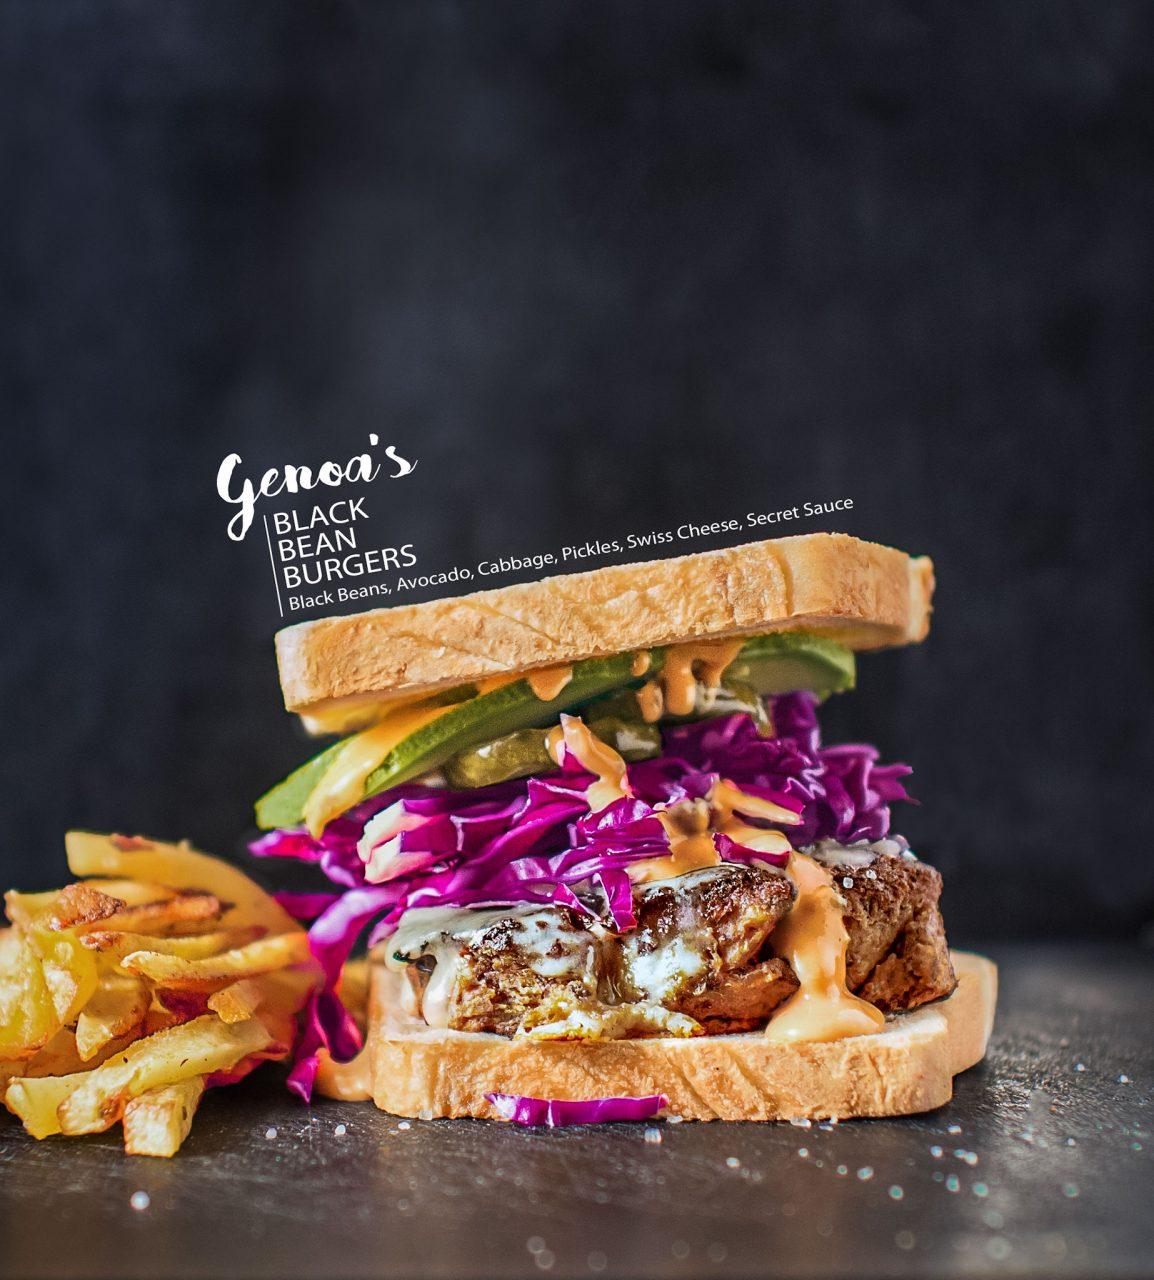 Genoas_Black-Bean-Burger_V0_Web